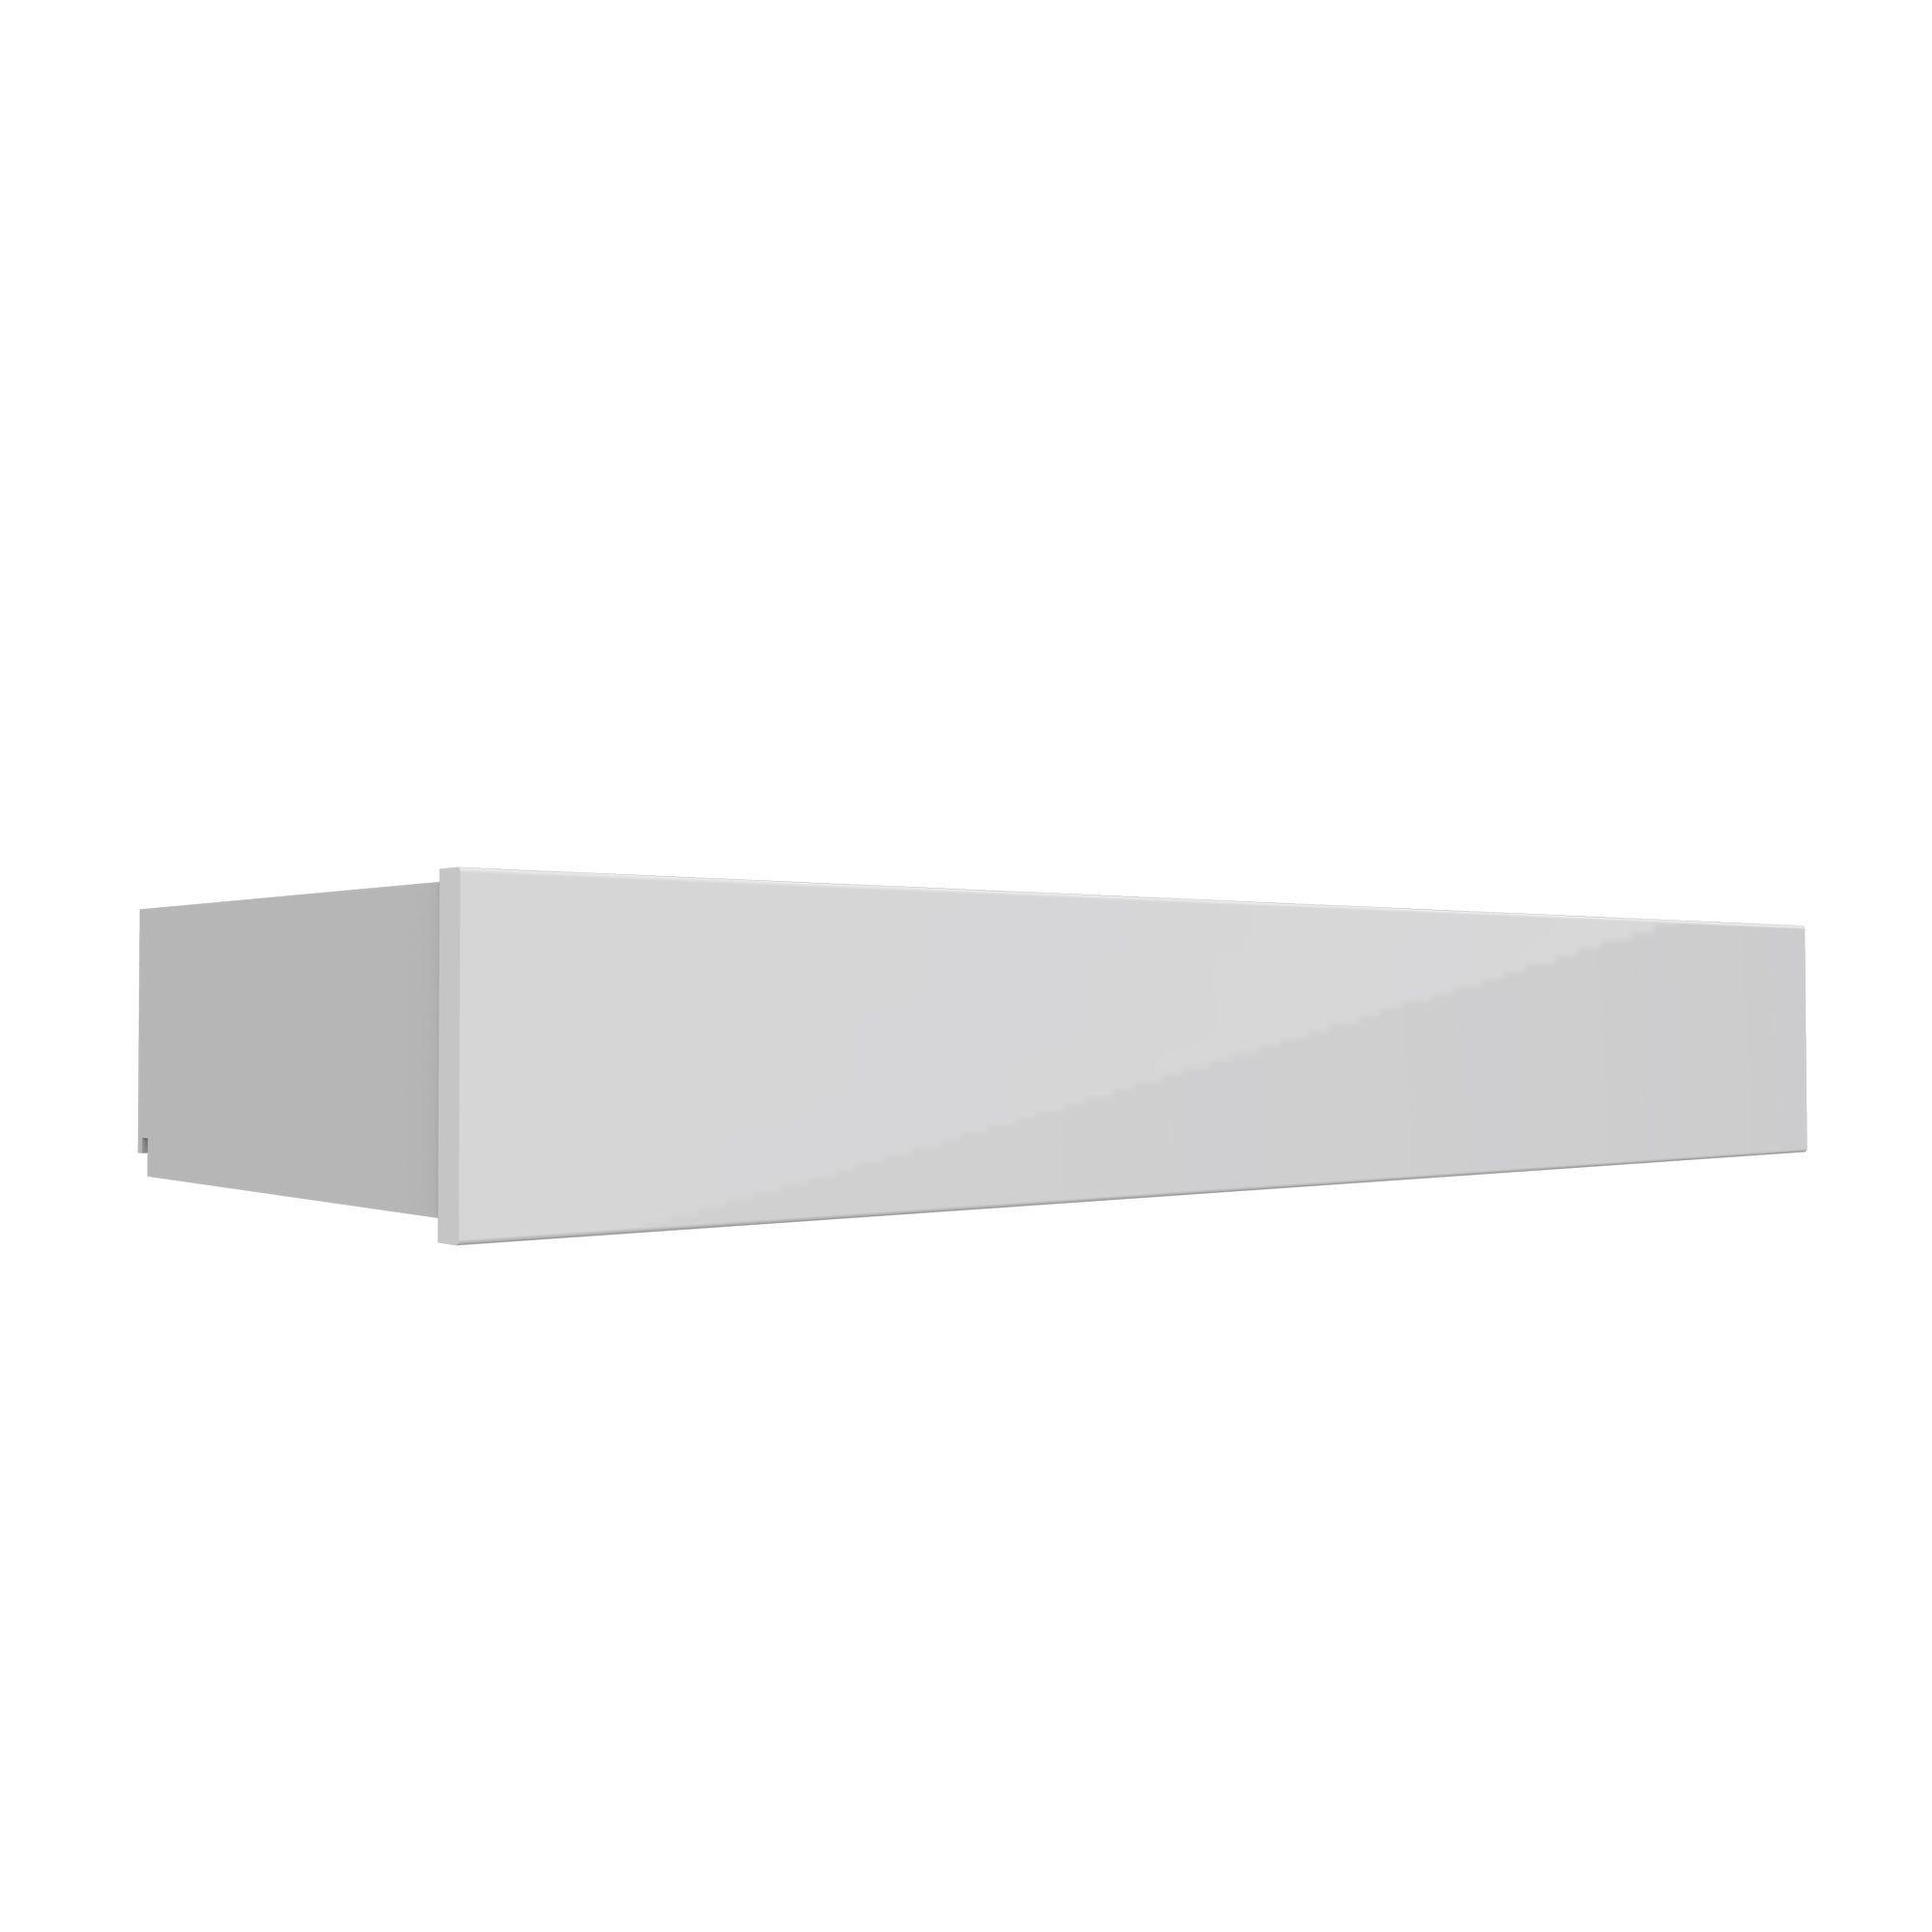 Darwin Modular White Internal Drawer (w) 1000mm (d) 566mm